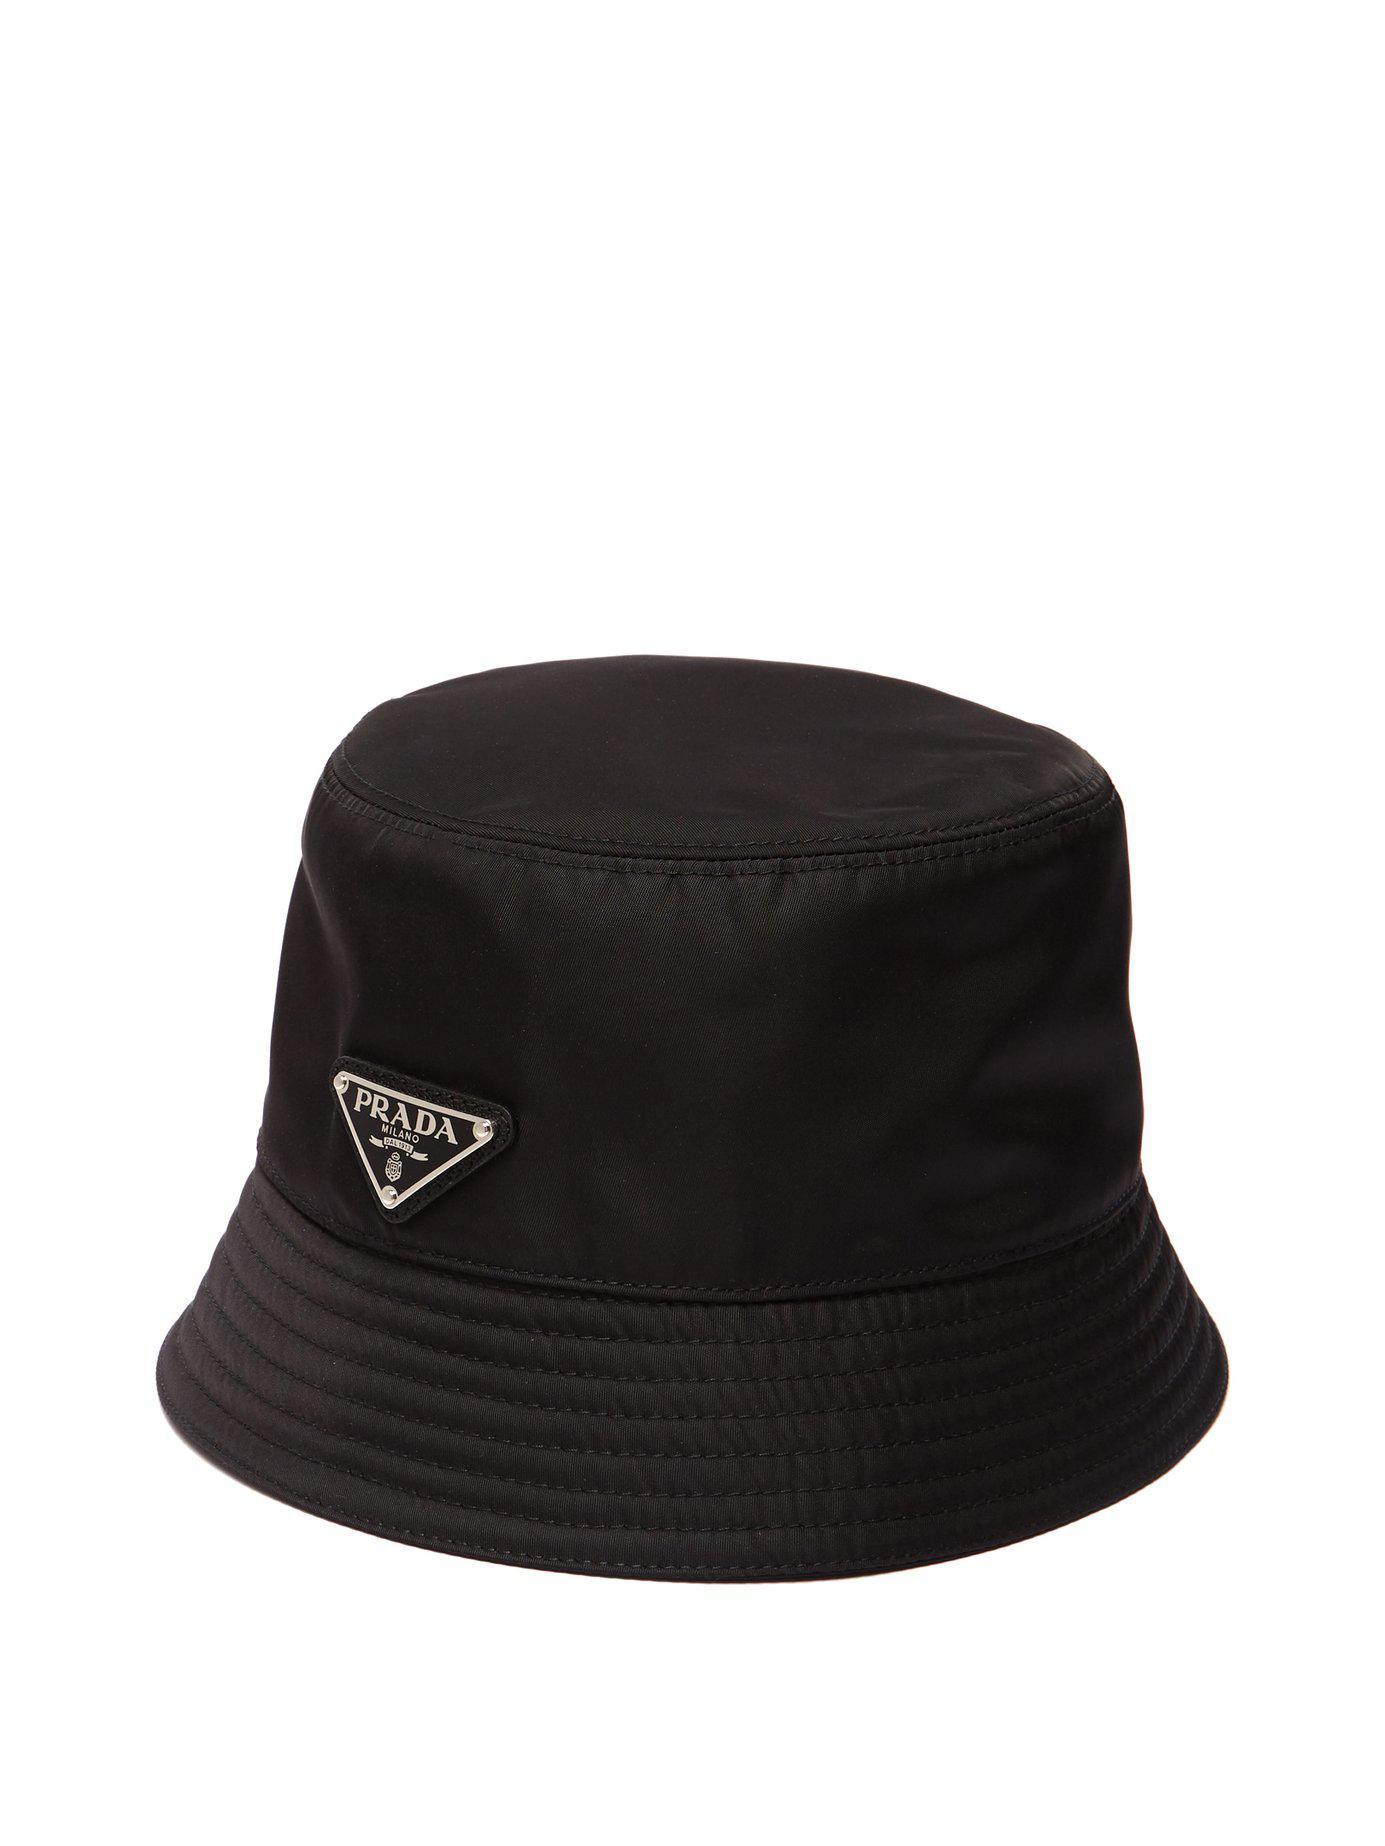 6735f76c Prada - Black Nylon Bucket Hat for Men - Lyst. View fullscreen